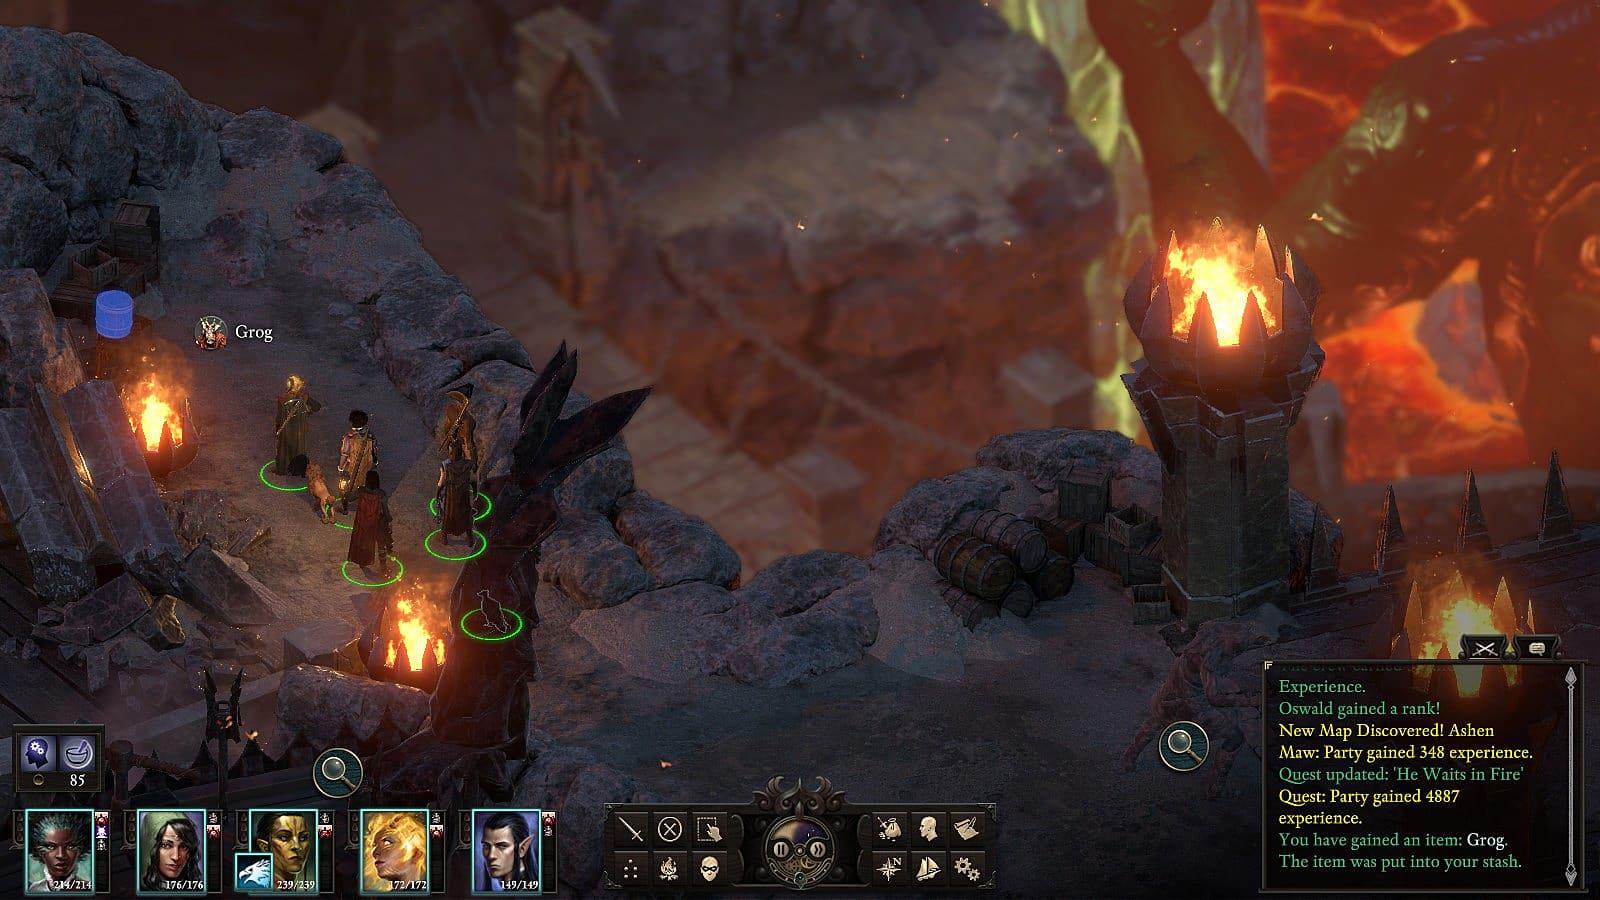 Pillars of Eternity 2: Deadfire Pet Locations and Pet Bonuses